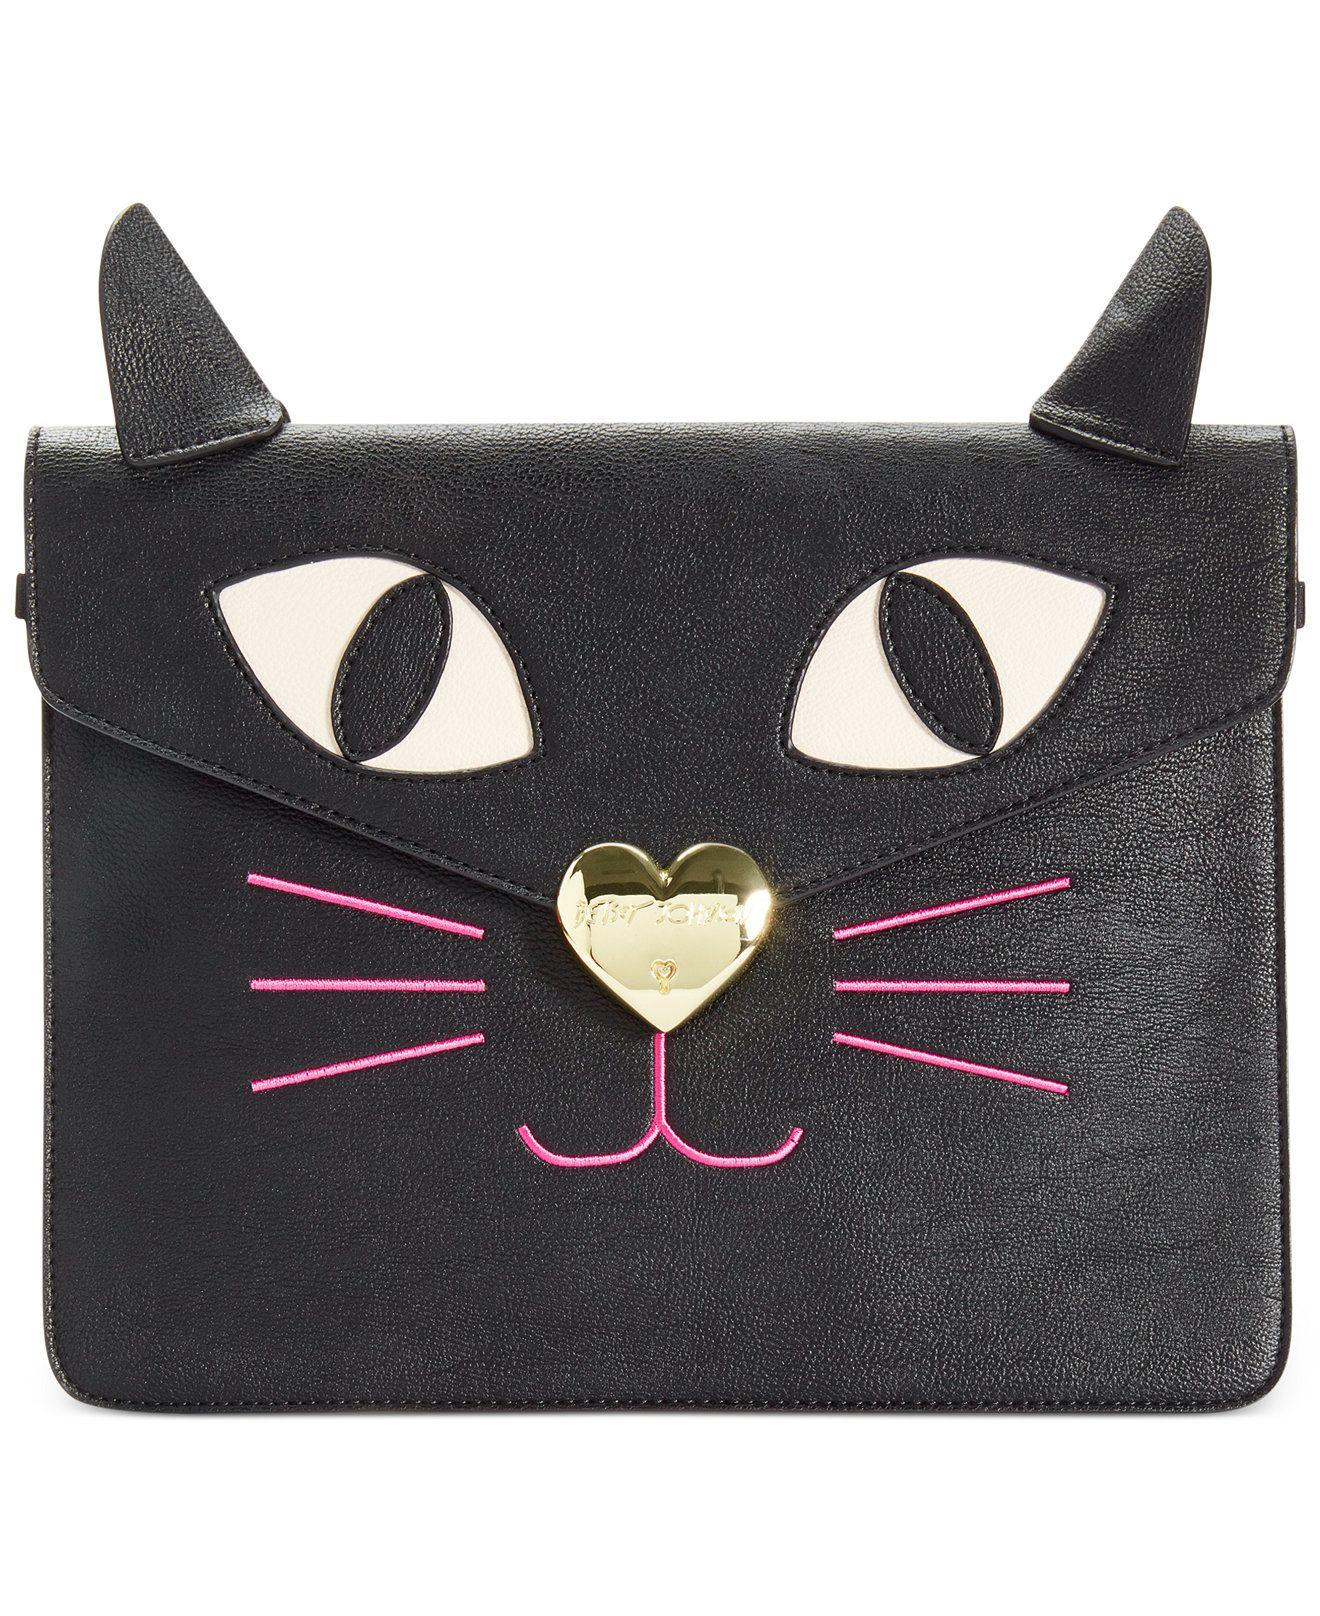 Betsey Johnson Kitchi Cat Clutch - All Handbags - Handbags & Accessories - Macy's